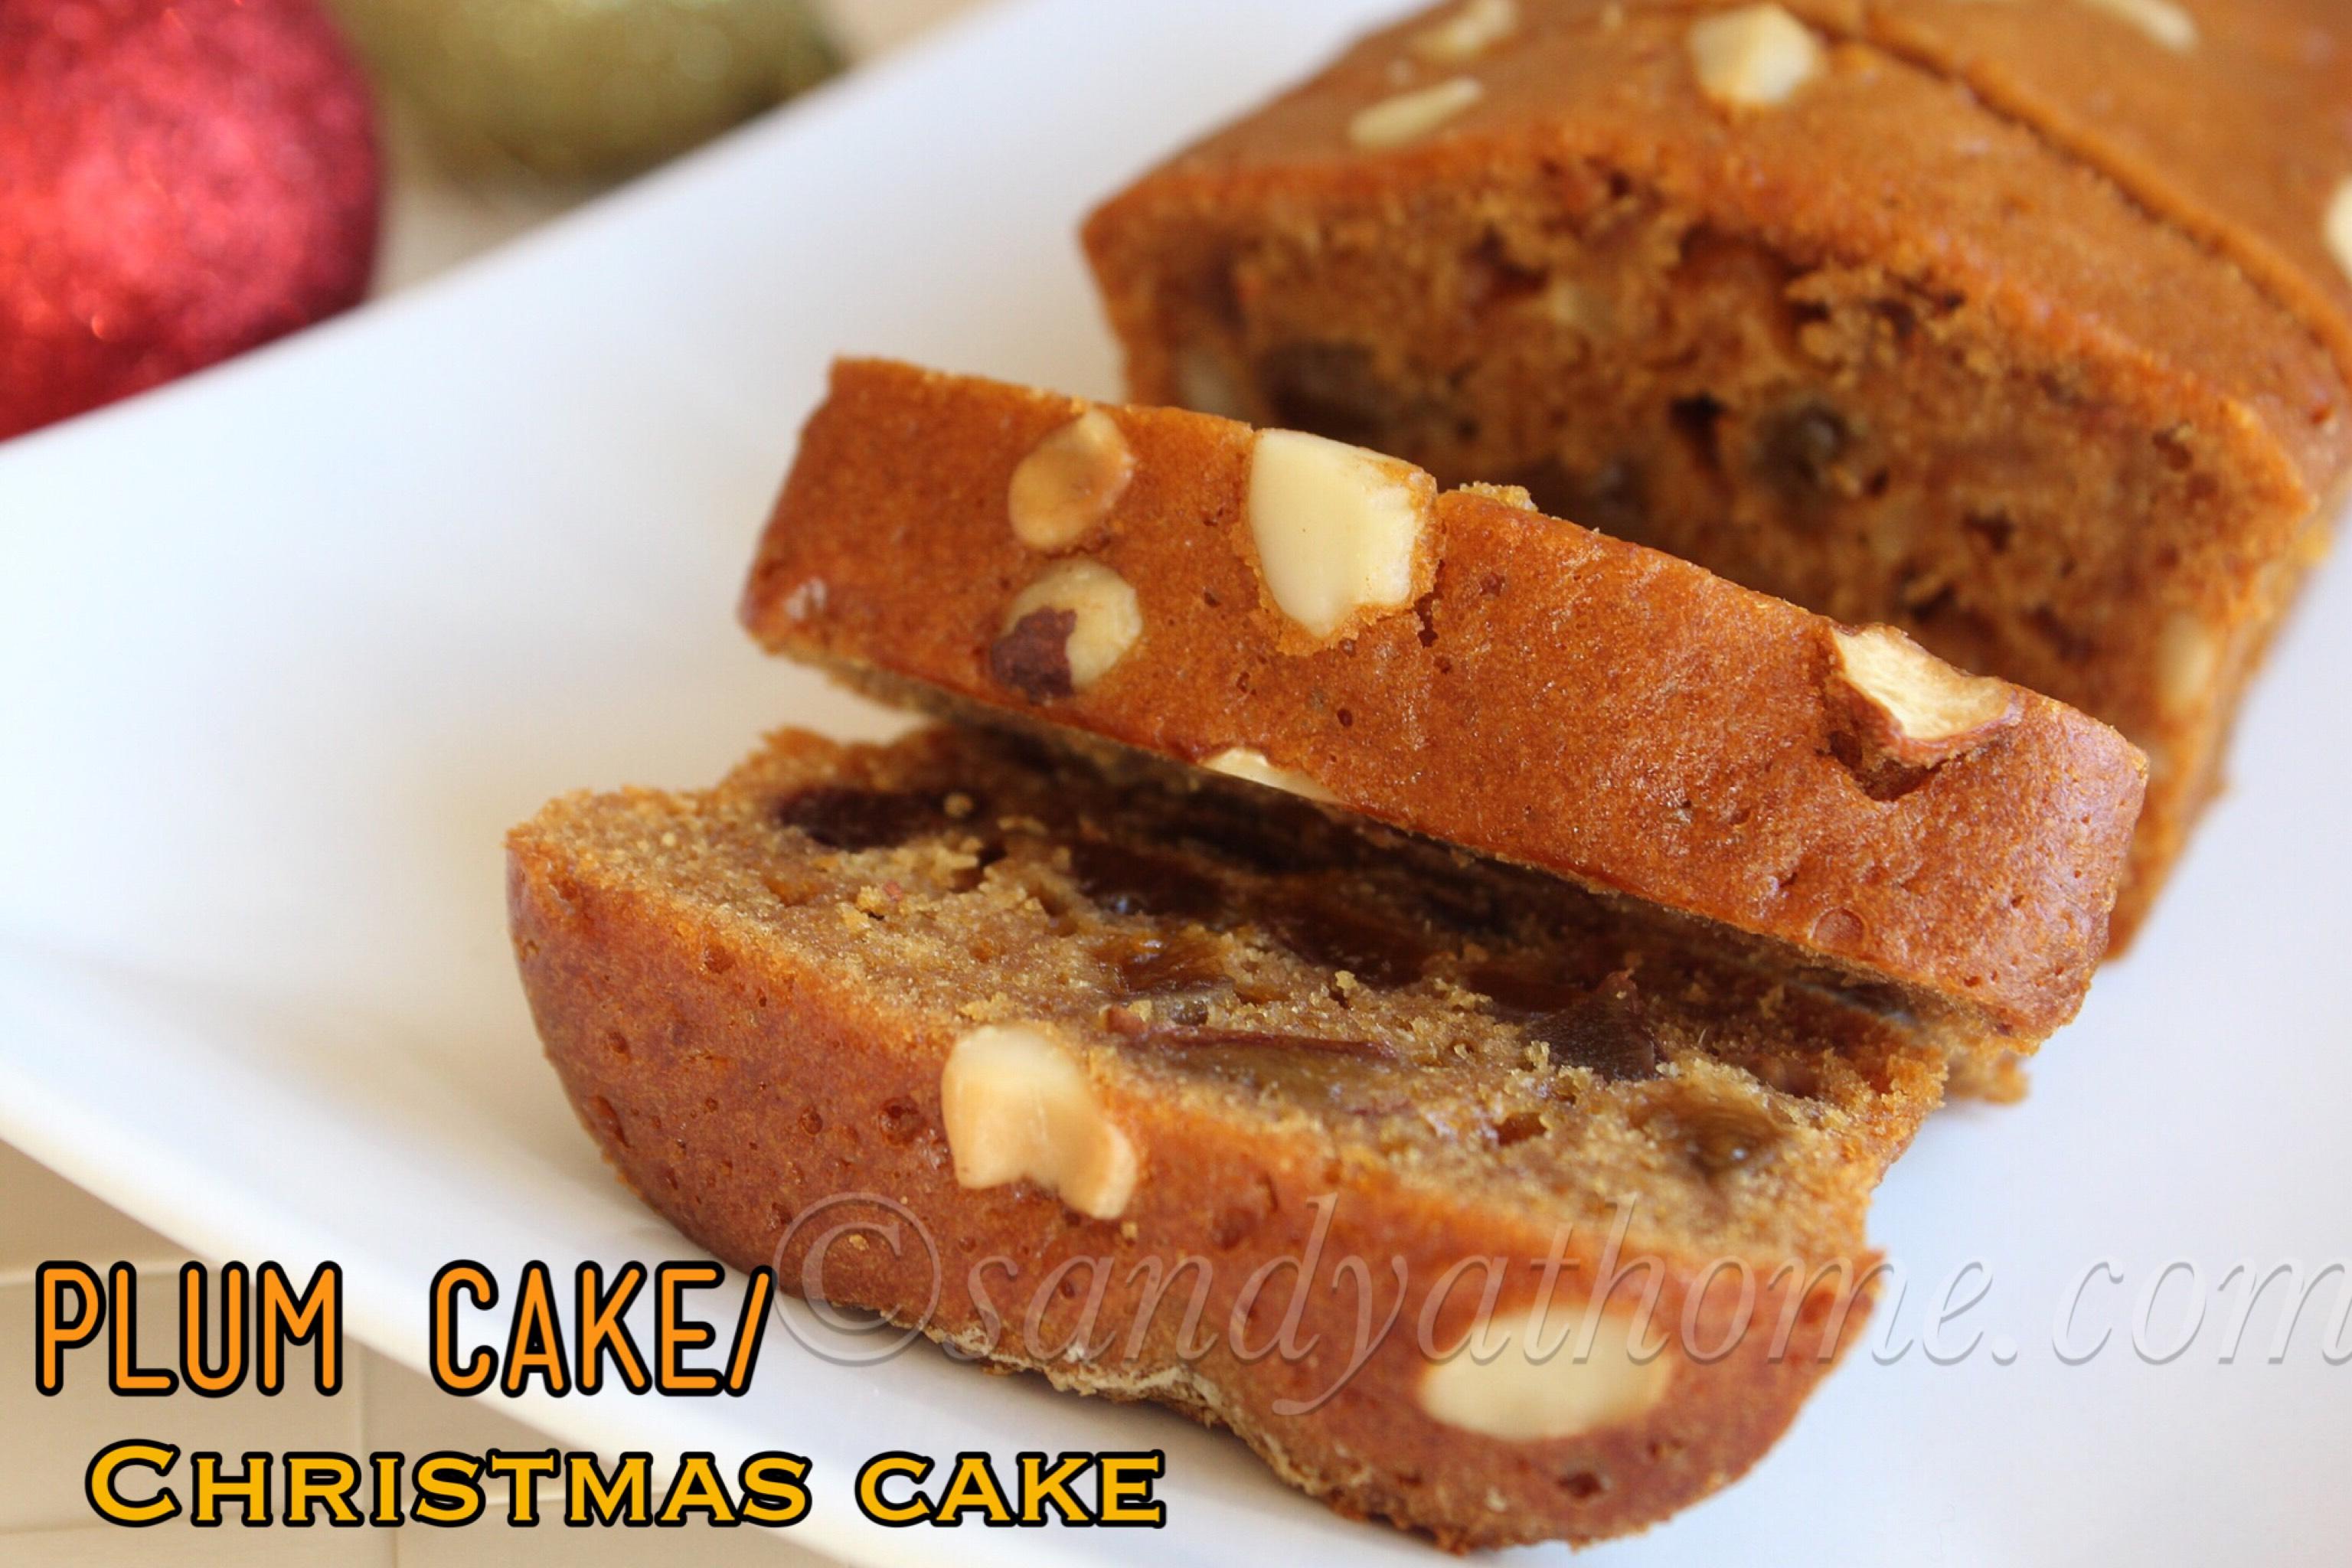 plum cake recipe without alcohol christmas cake sandhyas recipes